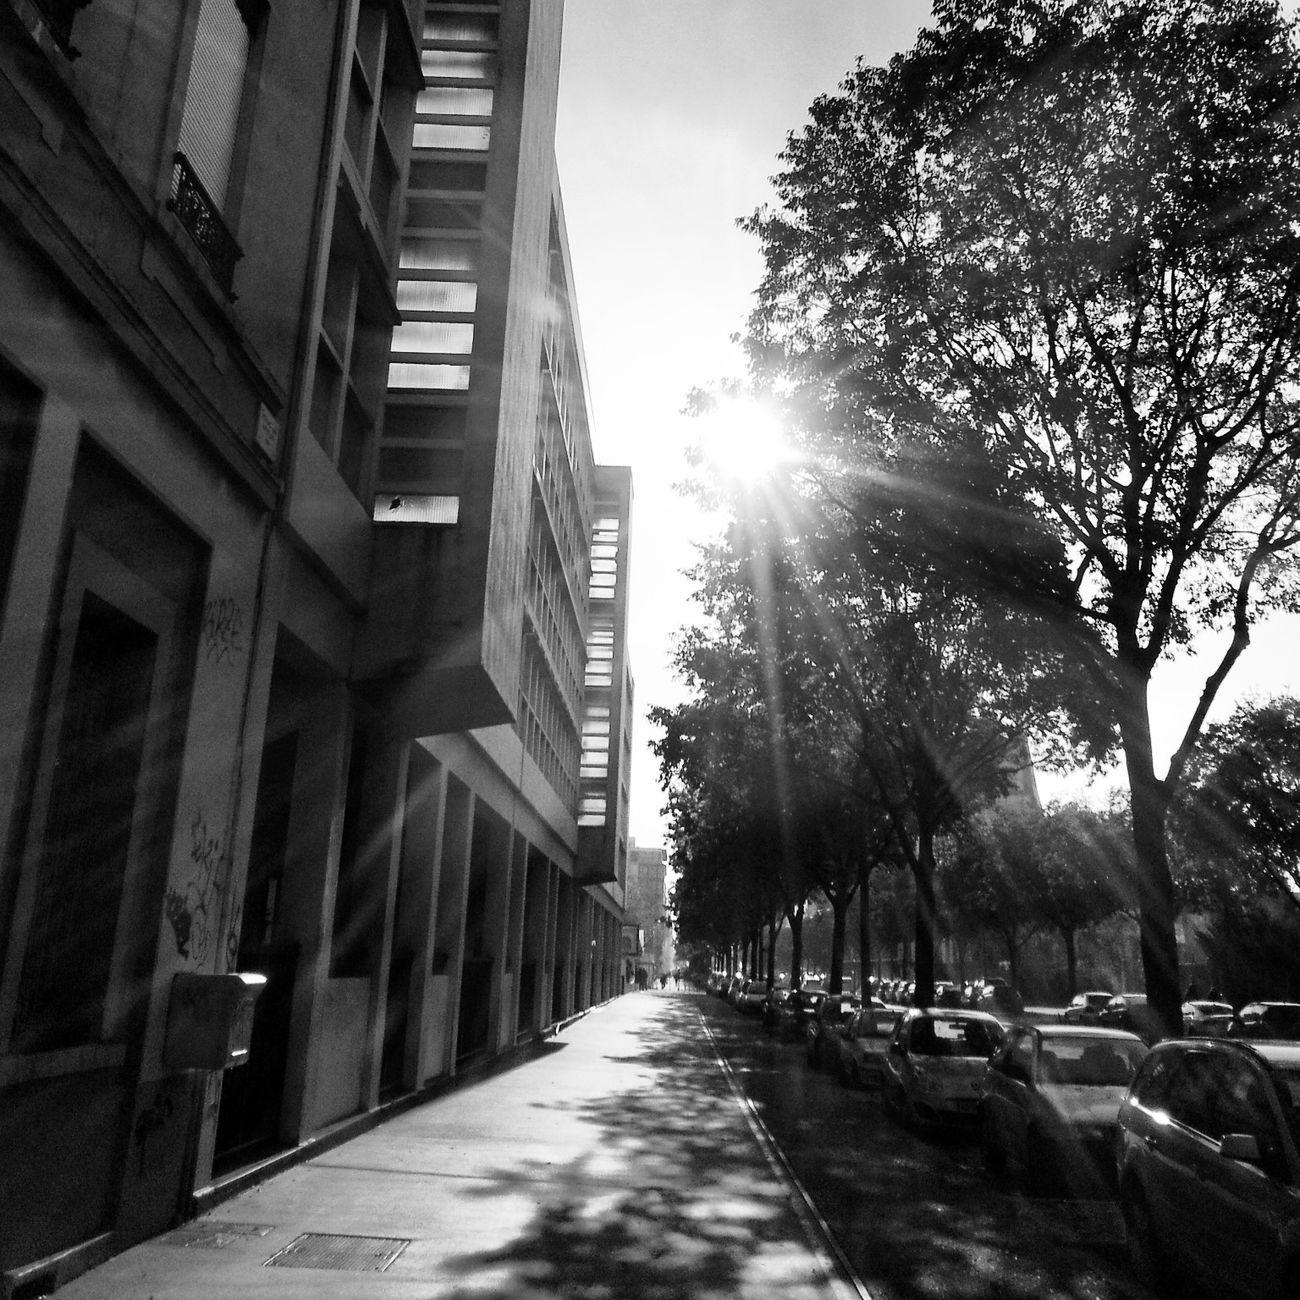 Buildings streets sunlight